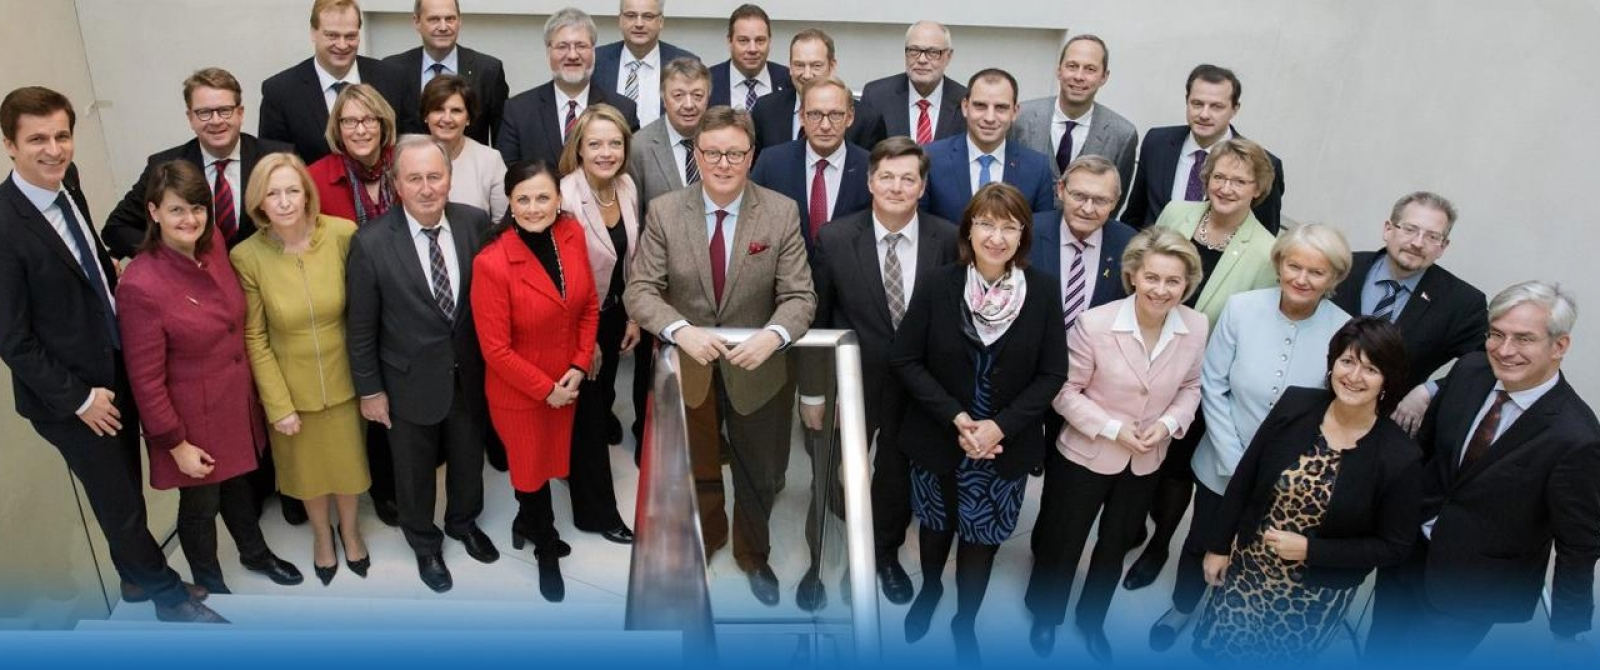 oliver-grundmann-stade-rotenburg-politiker-cdu-berlin-bundestag-mdb (56)